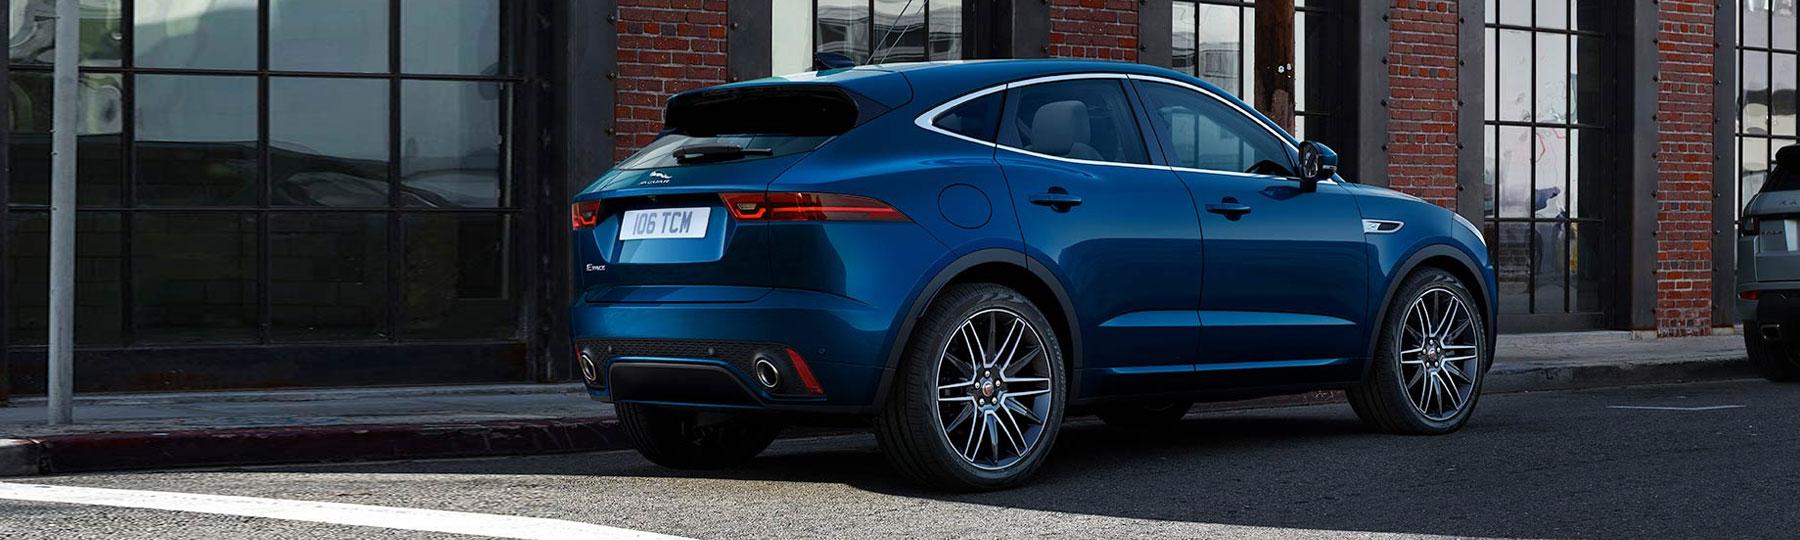 New Jaguar E-PACE New Car Offer